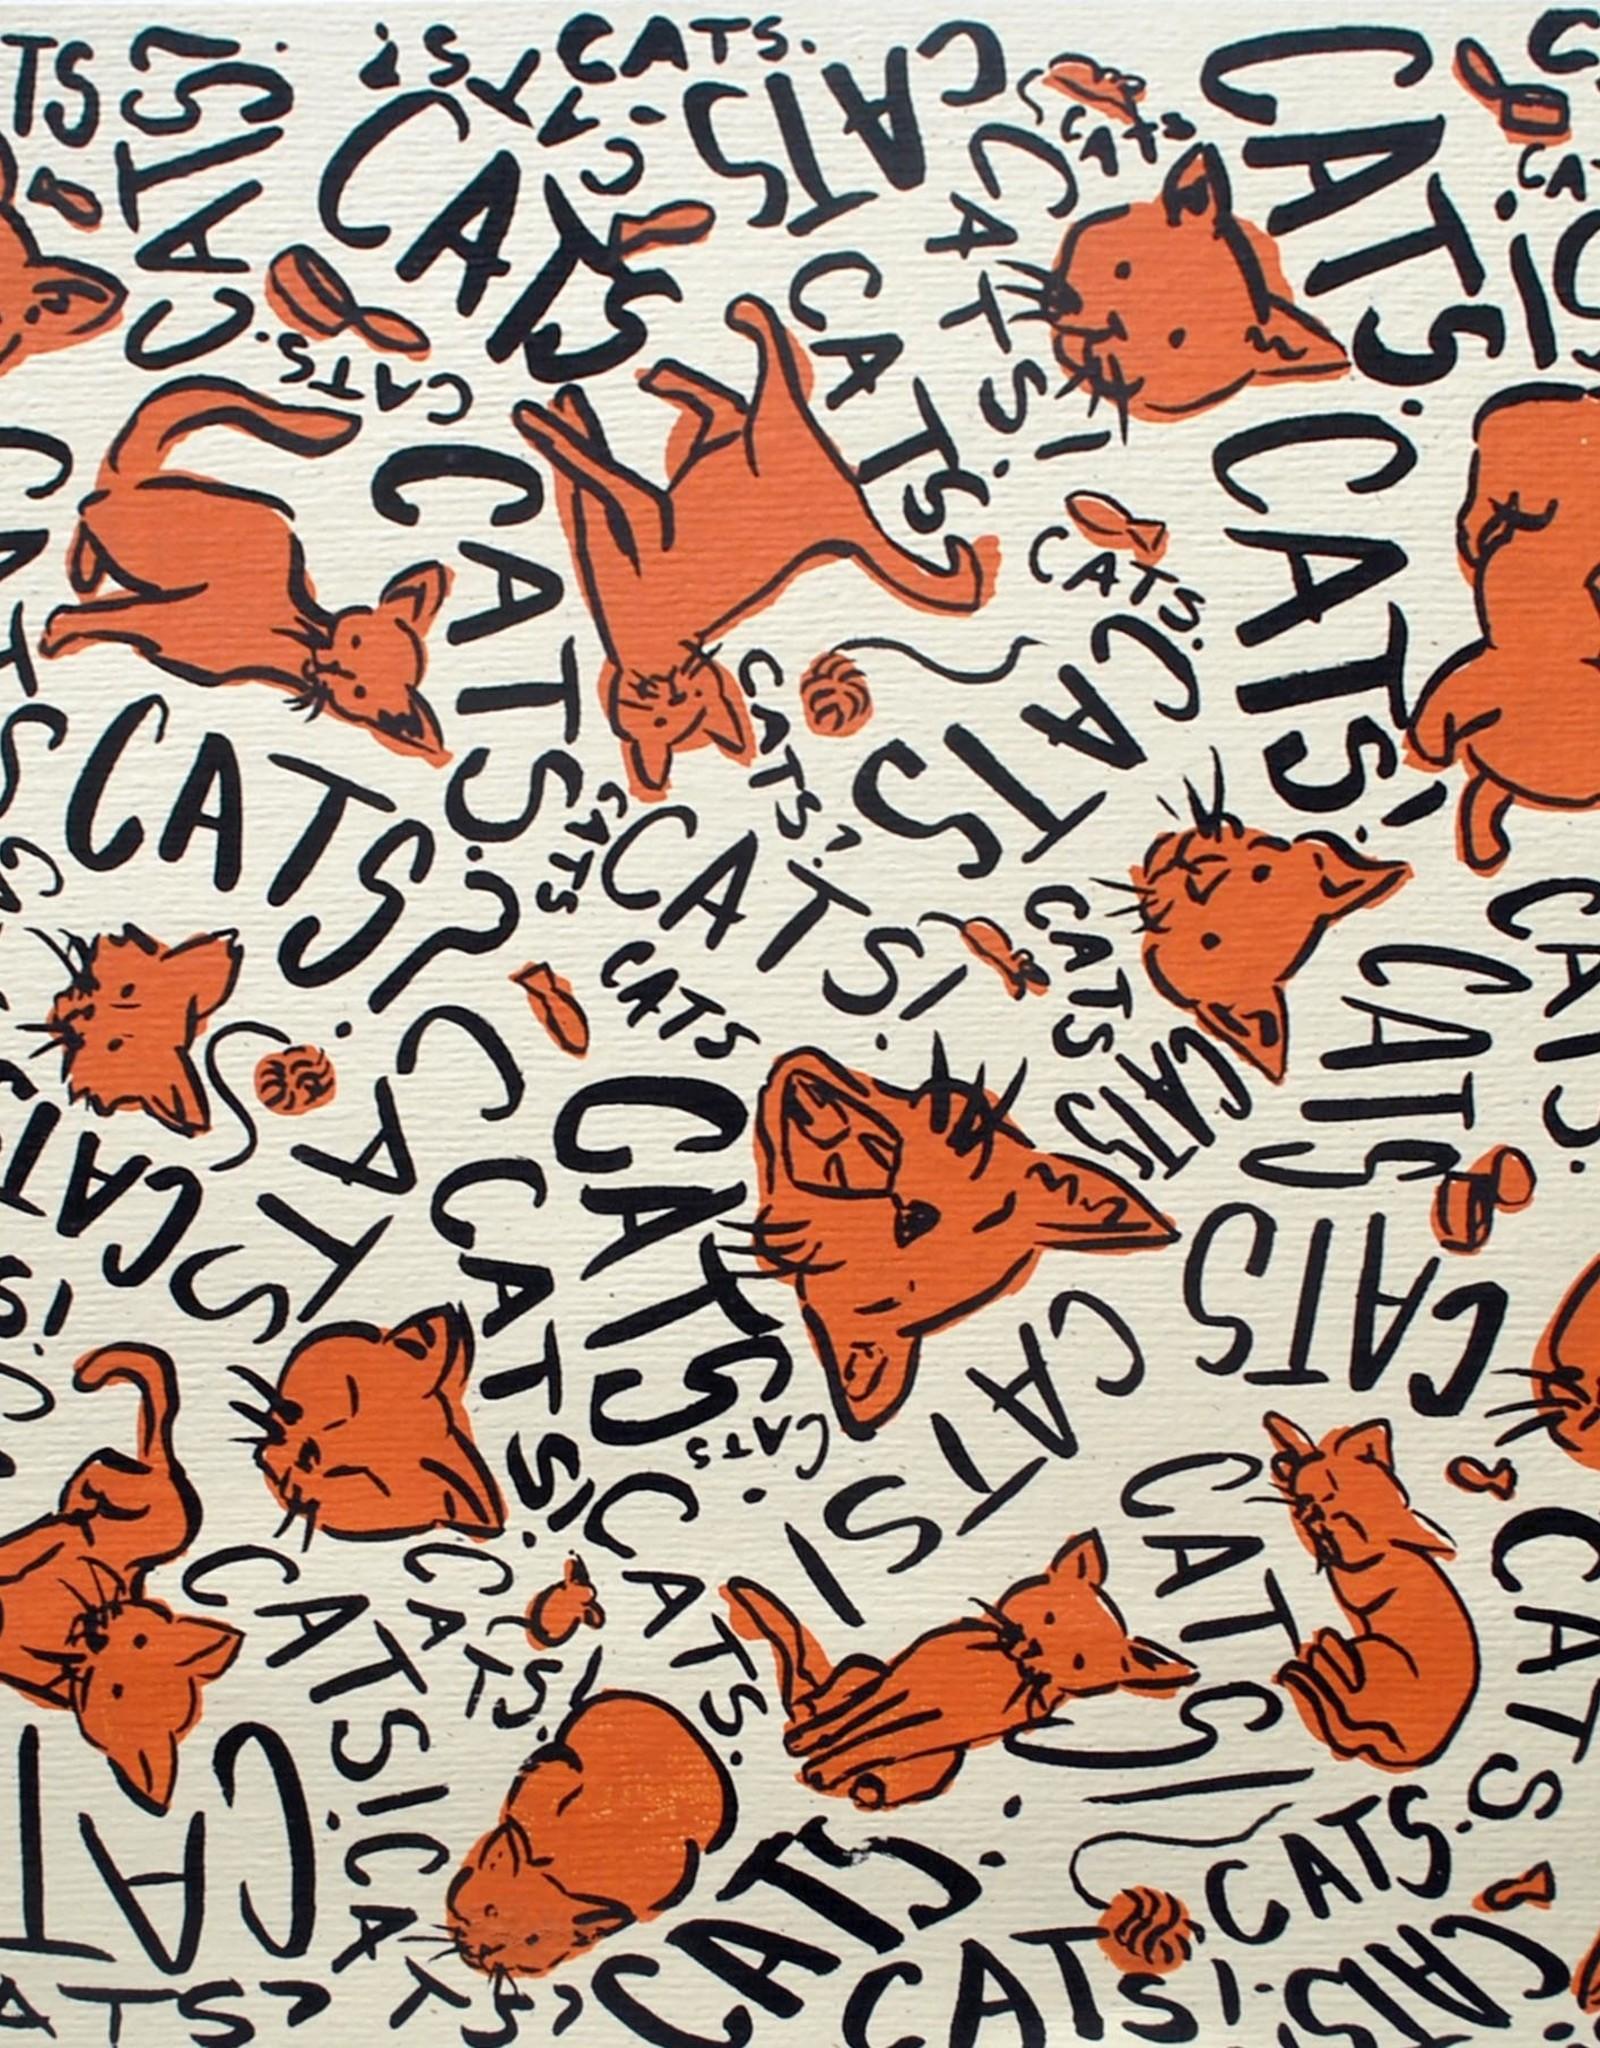 """CATS!"" by Sidney Trobee"